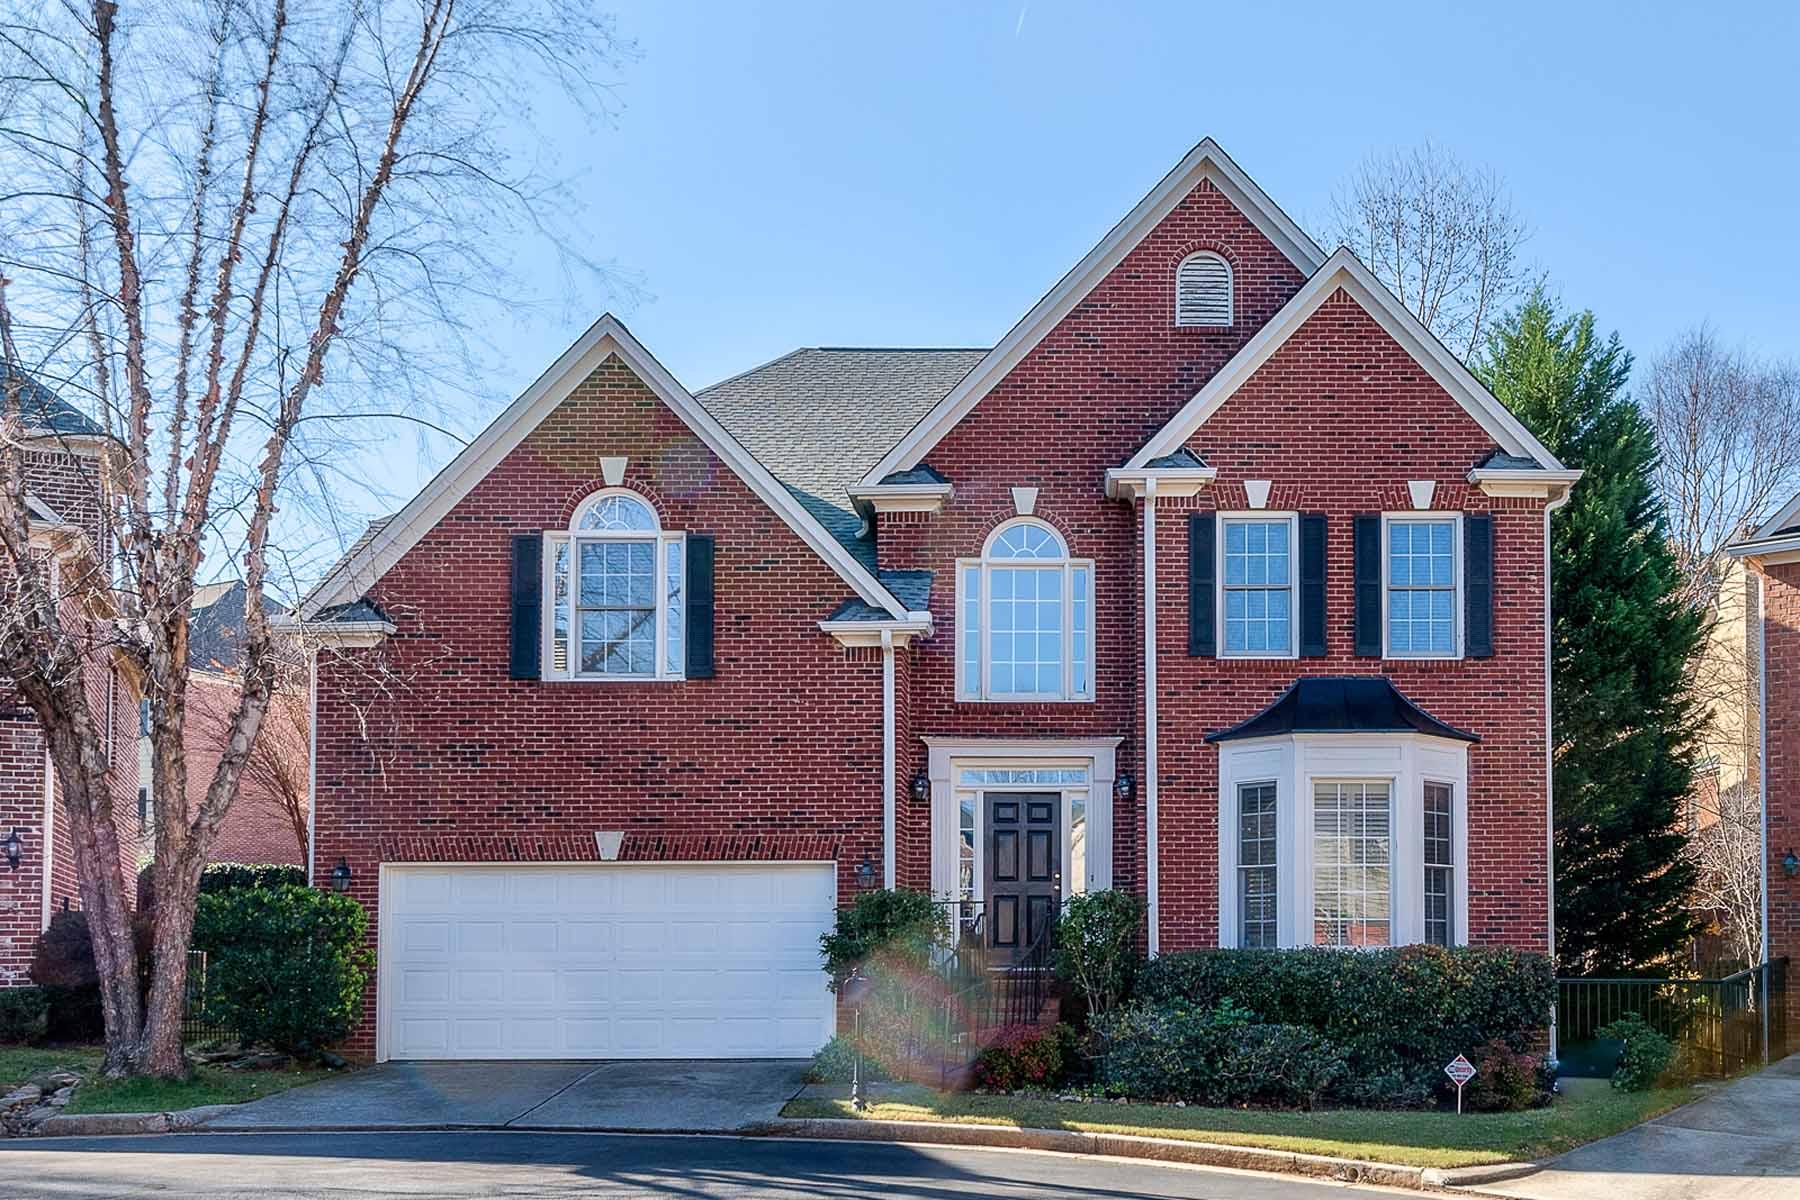 独户住宅 为 销售 在 Best value for Northlake area: cul-de-sac, square footage, convenient to 285/85 2429 Mill Ridge Walk 亚特兰大, 乔治亚州, 30345 美国